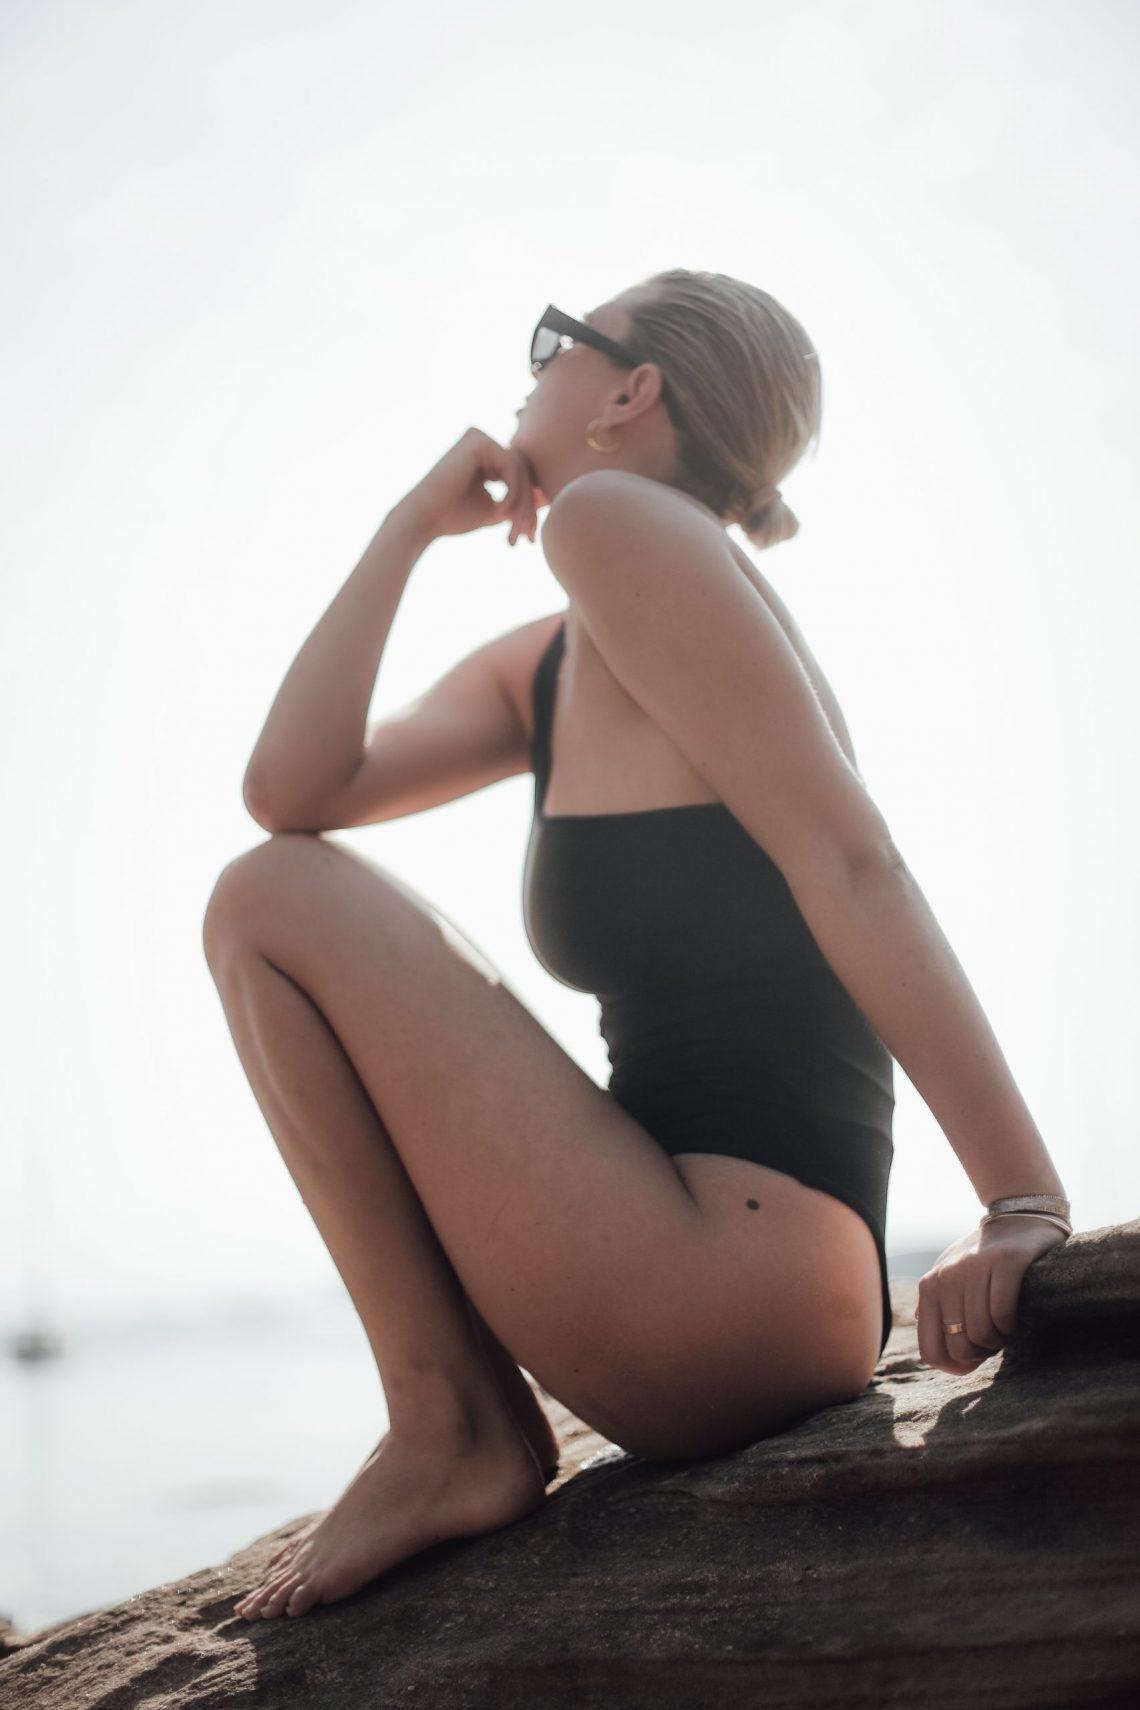 Job Report: Innes Lauren, Swimwear Designer